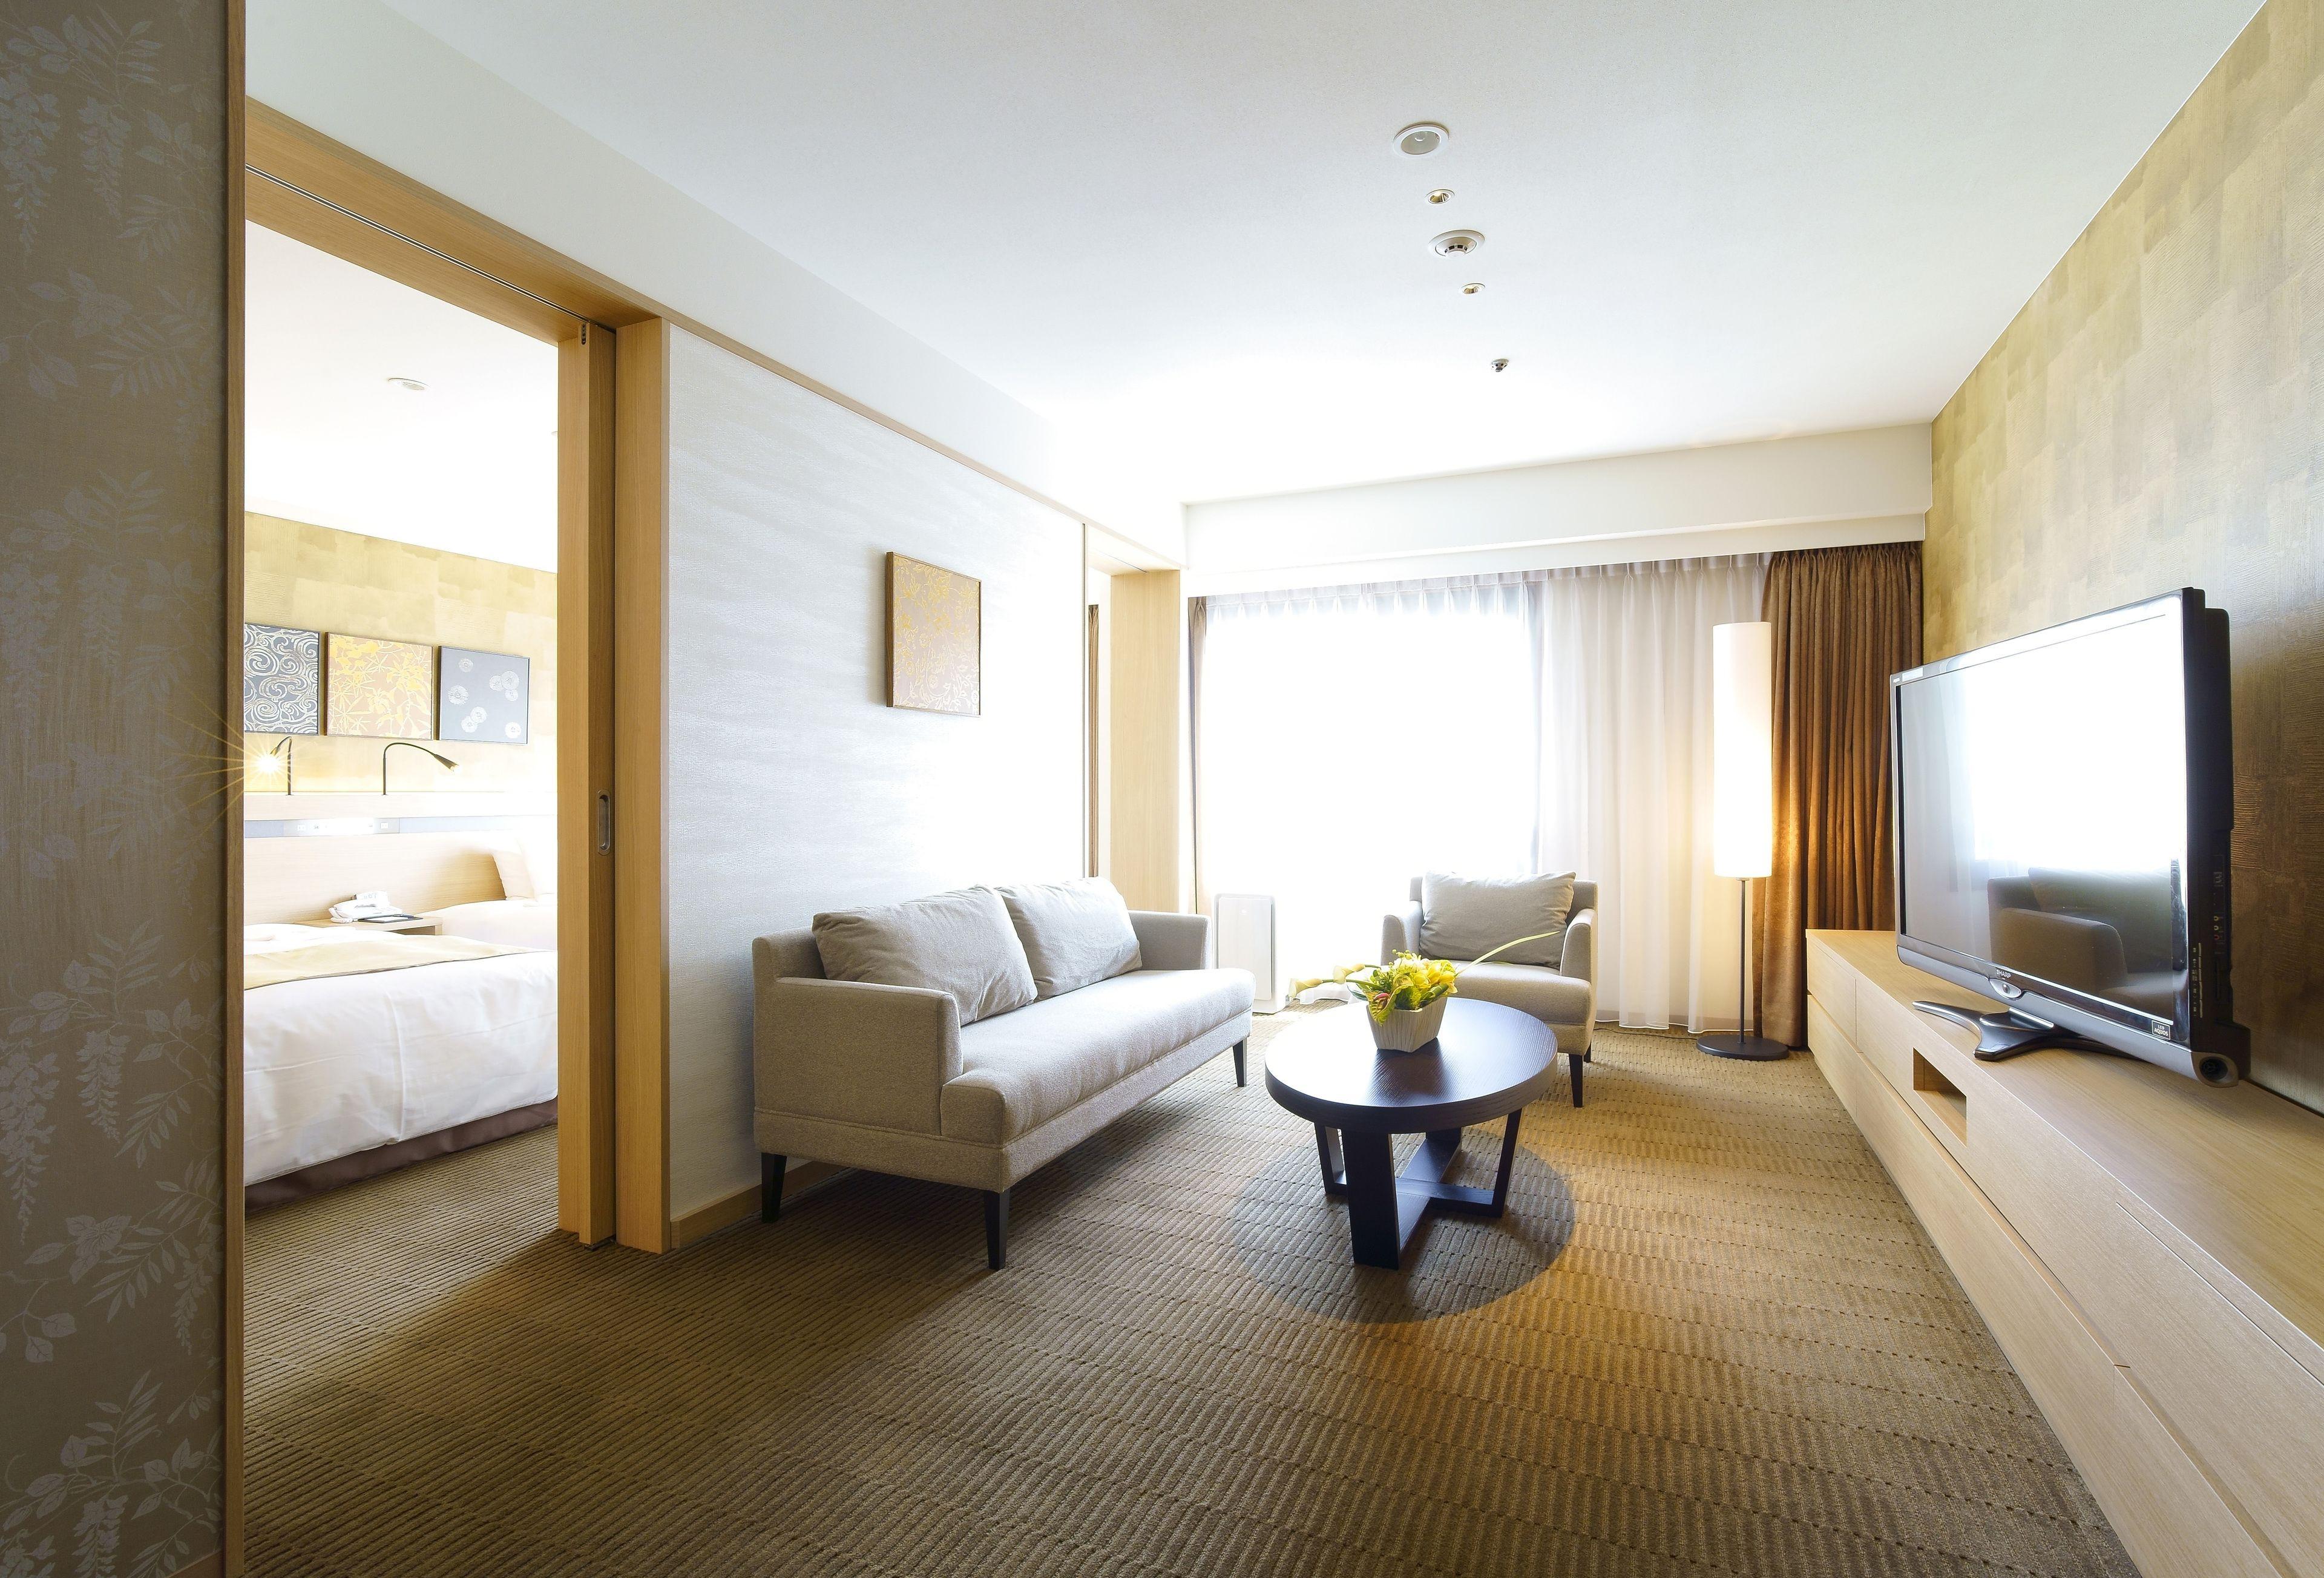 Courtesy of Karasuma Kyoto Hotel / Expedia